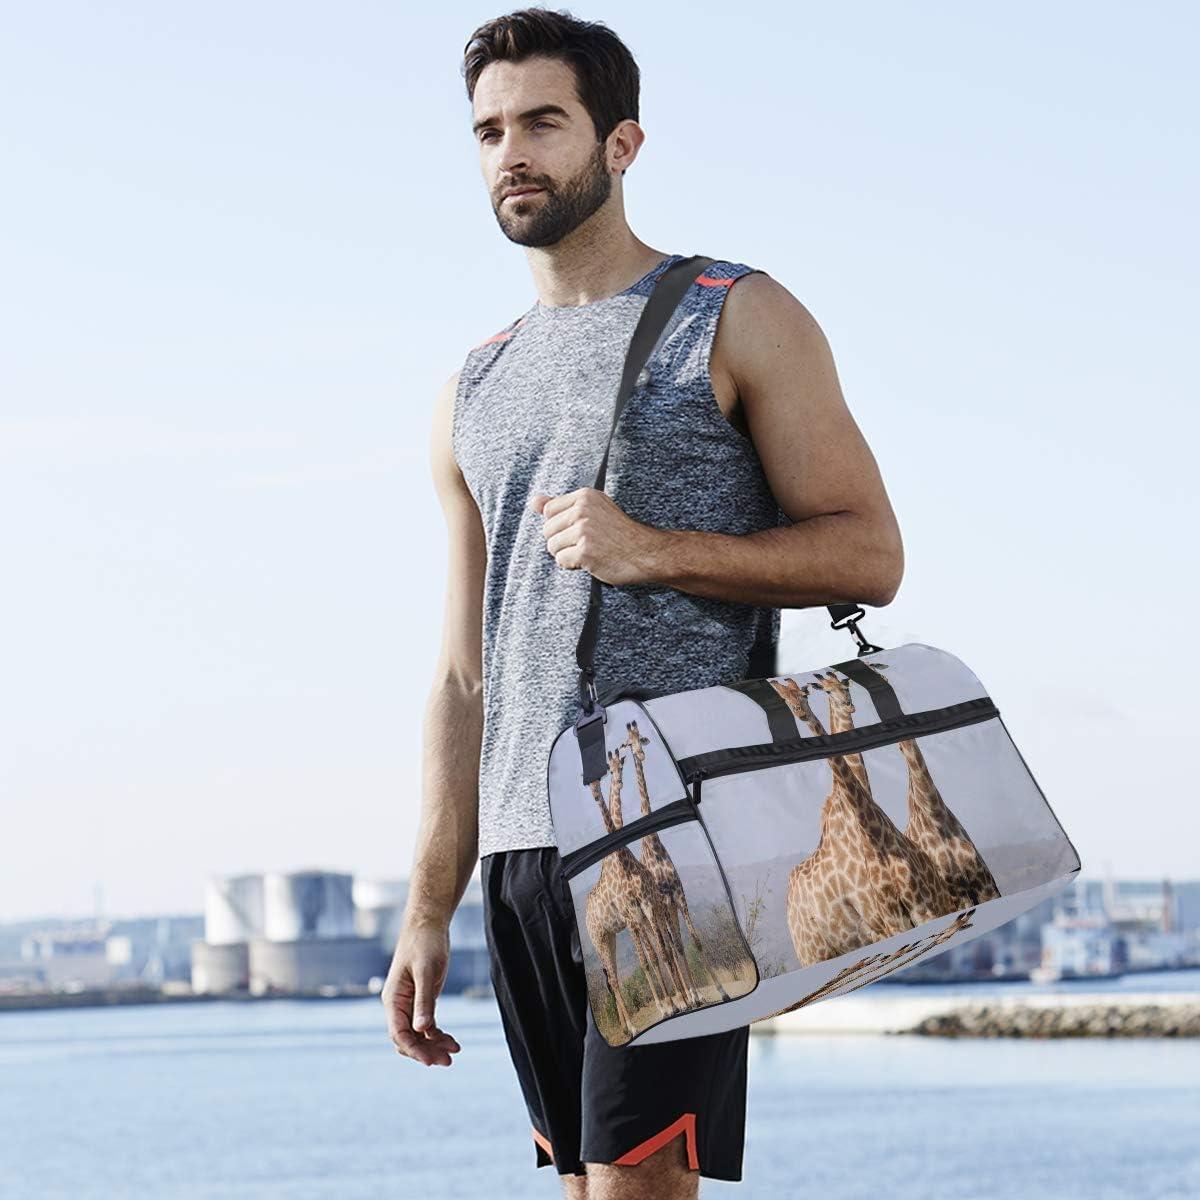 MALPLENA Animal Giraffe South Africa Packable Duffle Bag For Men Women Tear Resistant Sports Duffle